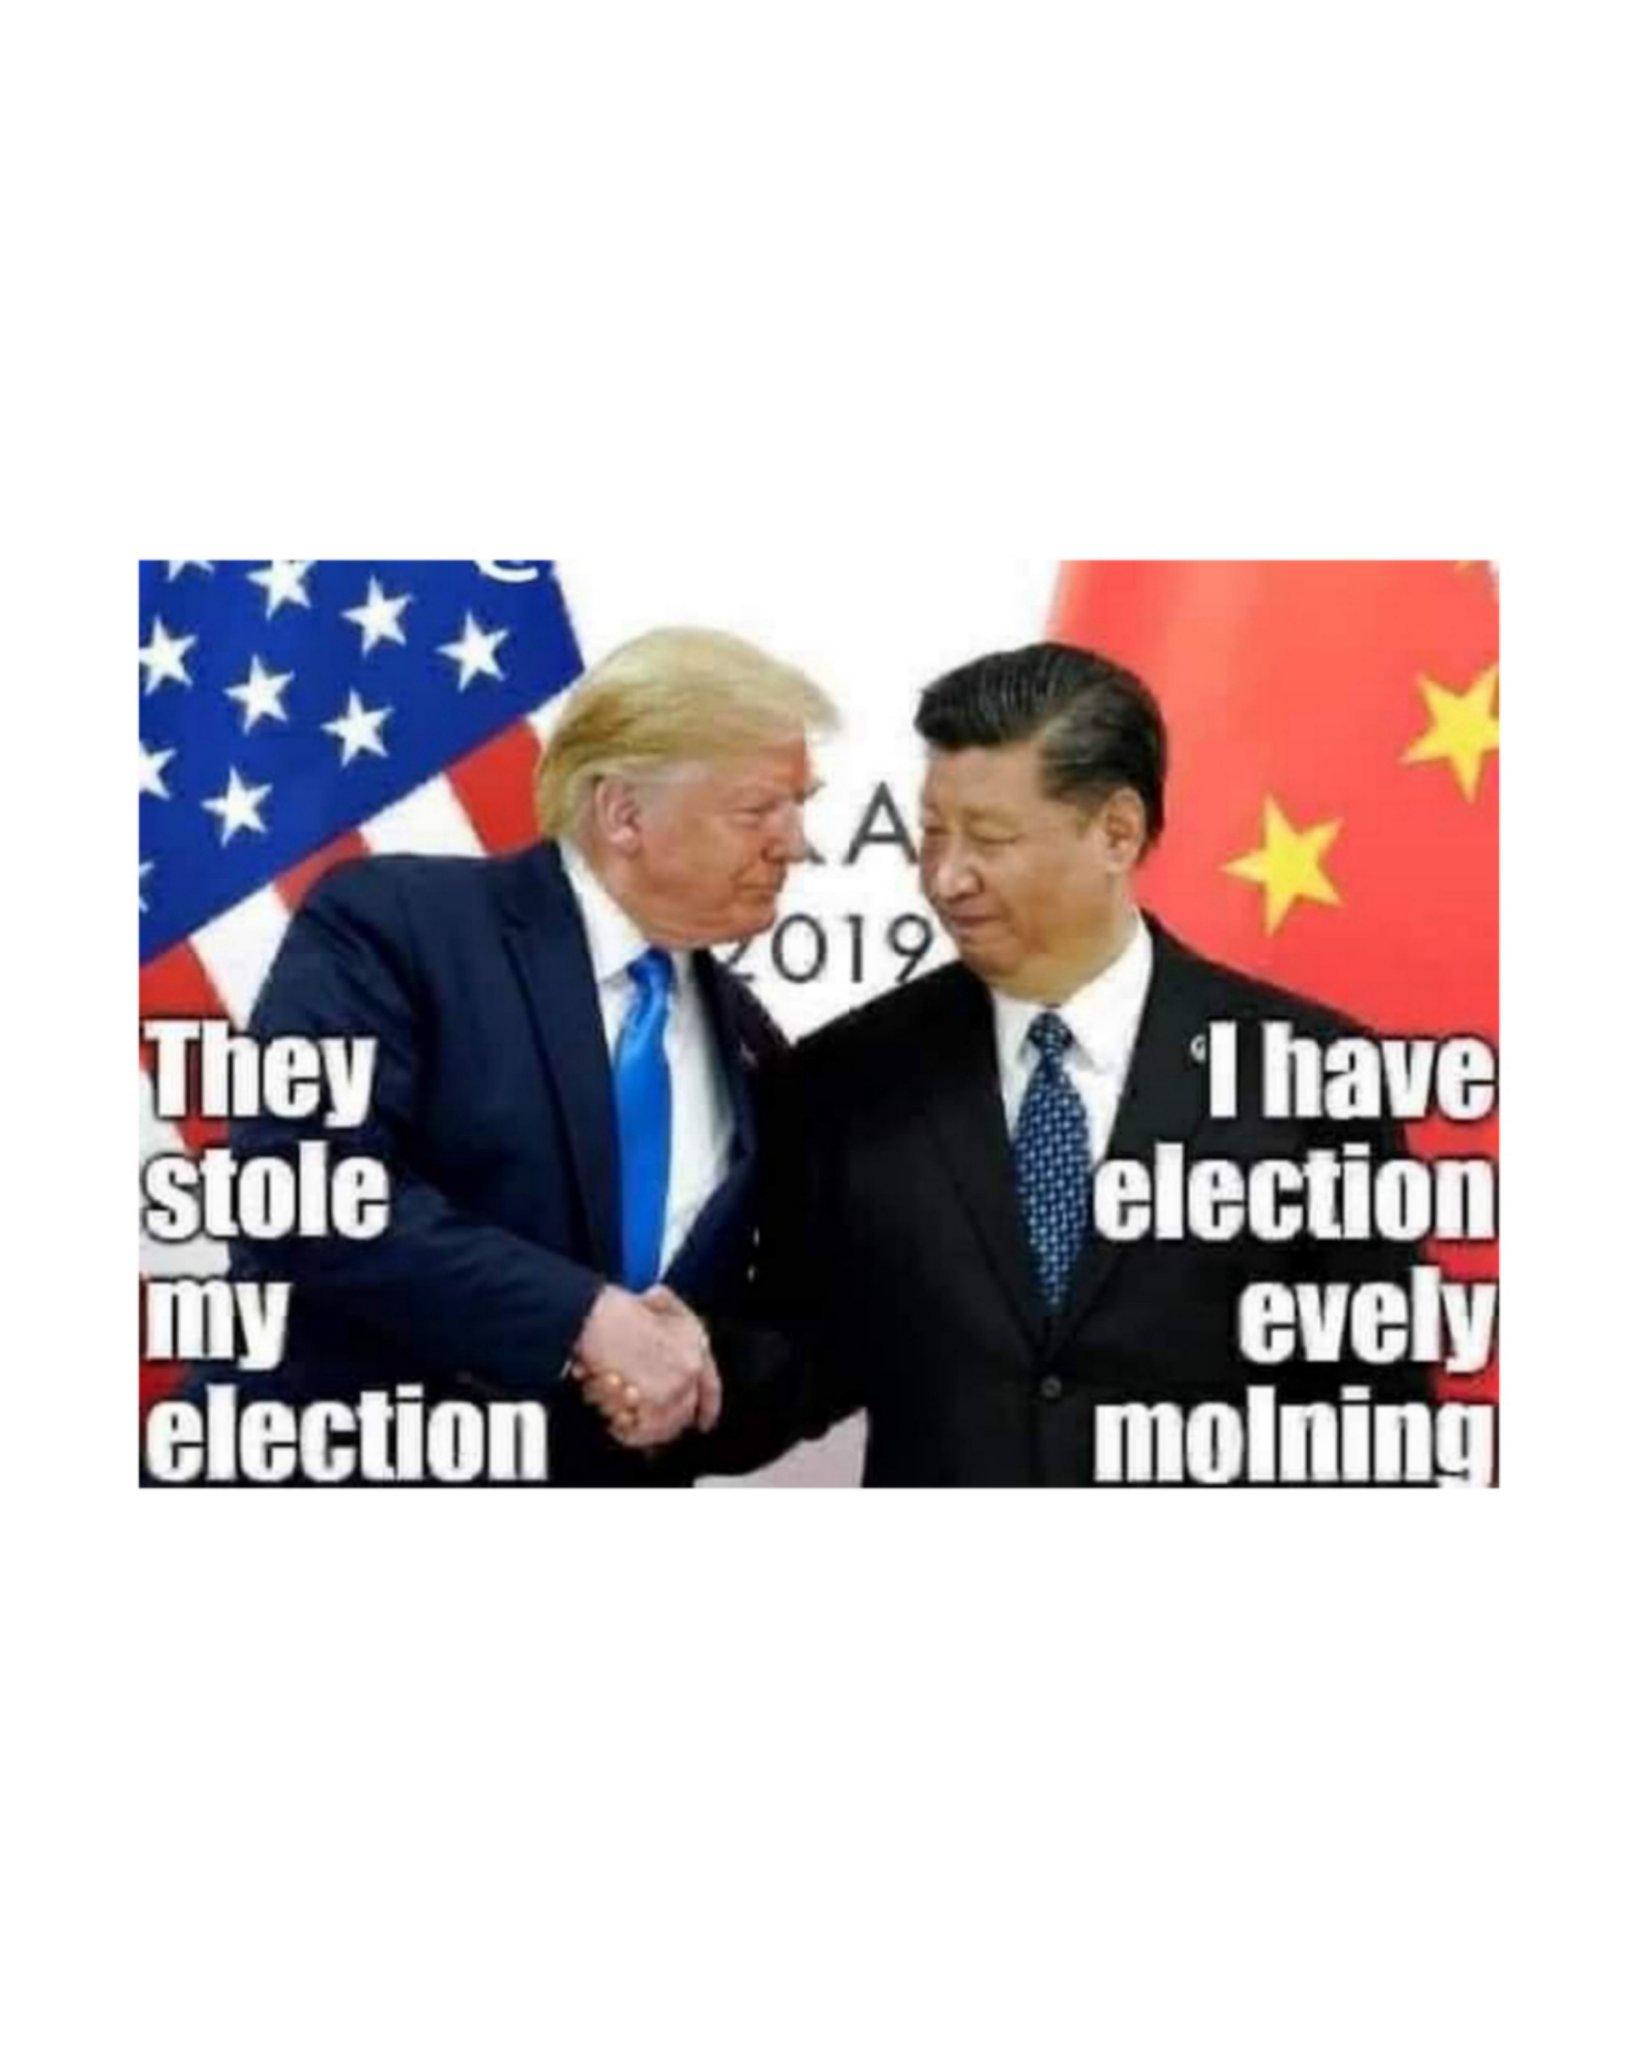 Happy election day! - meme